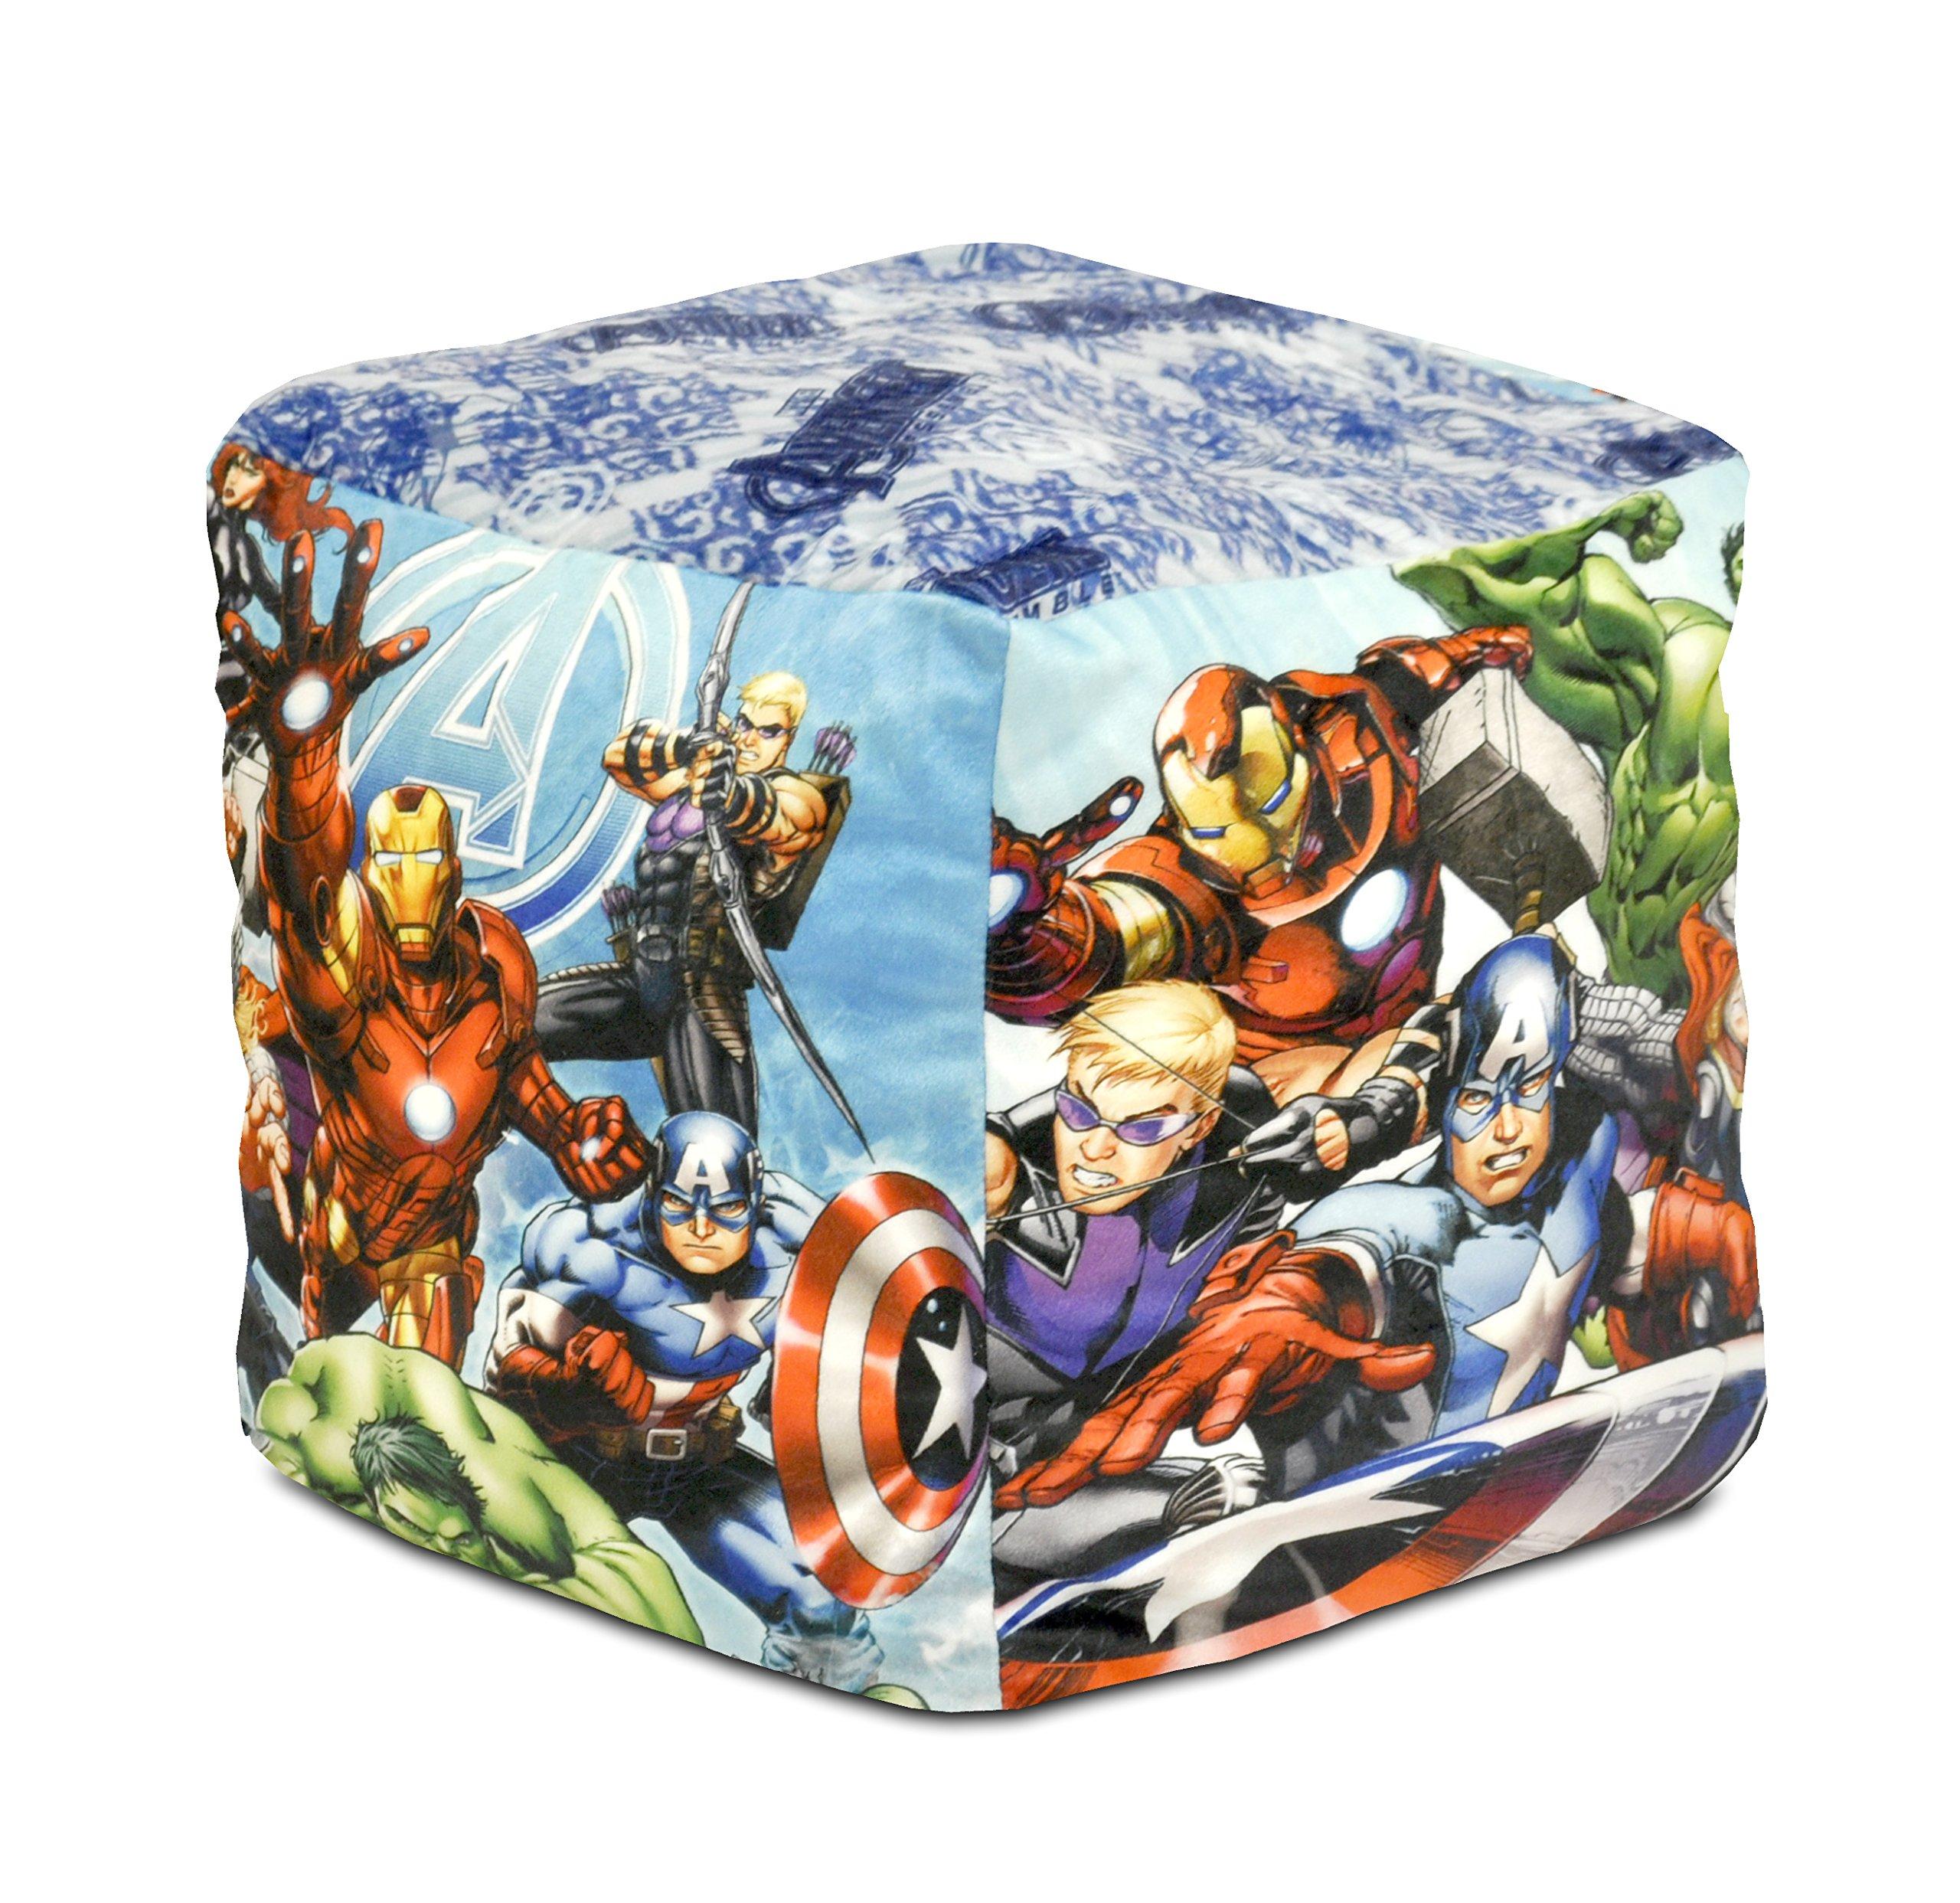 Marvel Avengers Square Pouf by Marvel